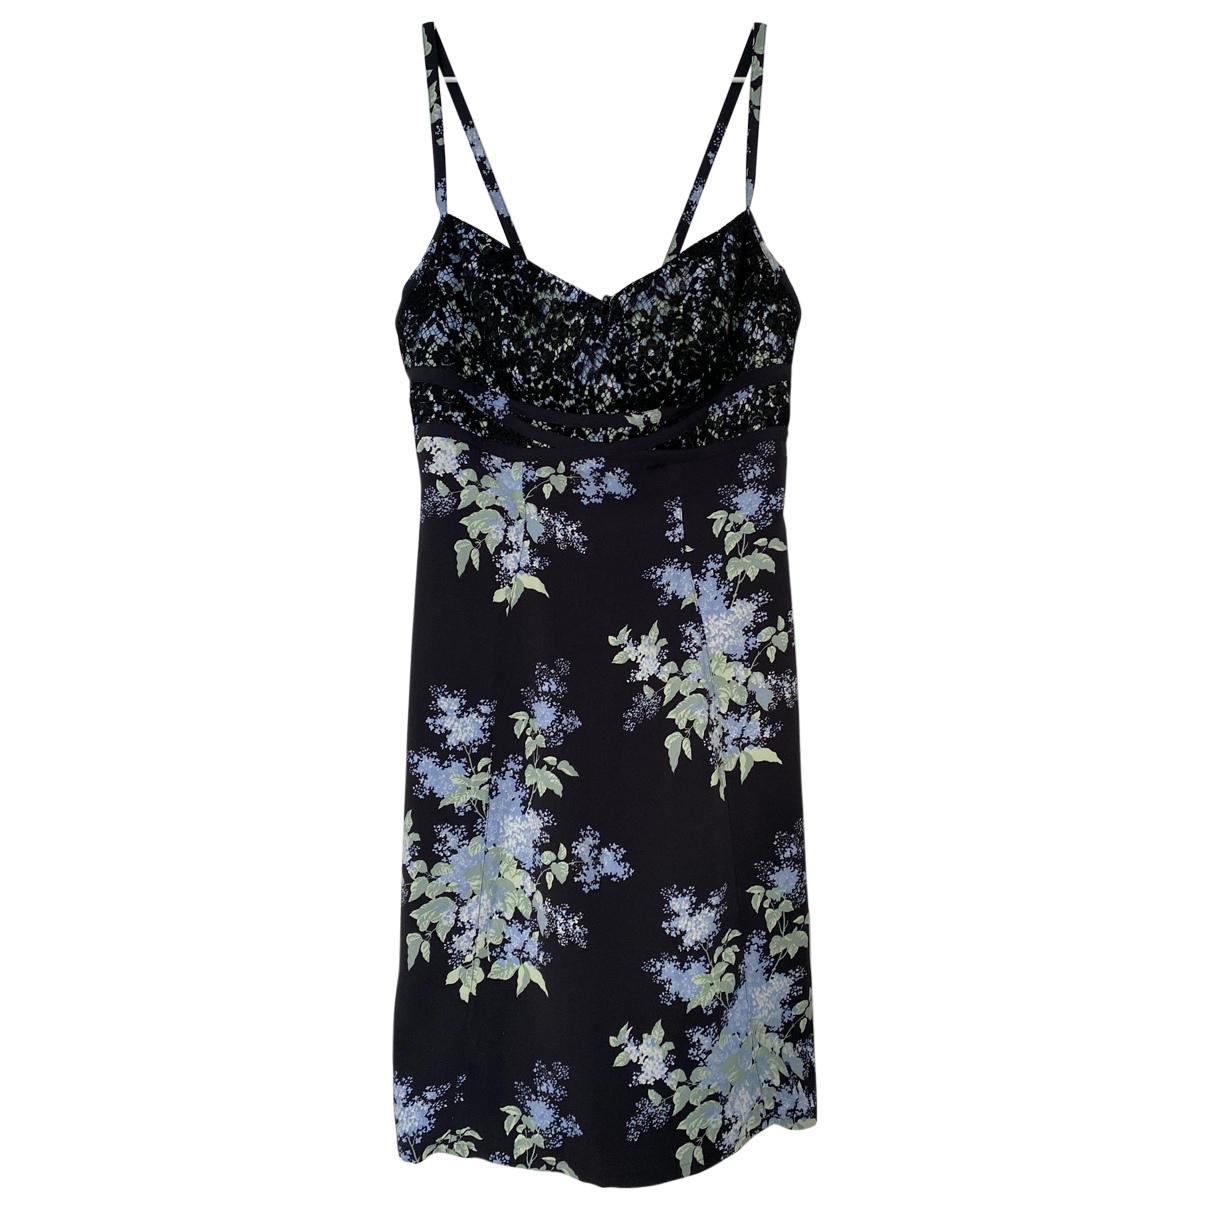 Thierry Mugler \N Multicolour dress for Women 36 FR